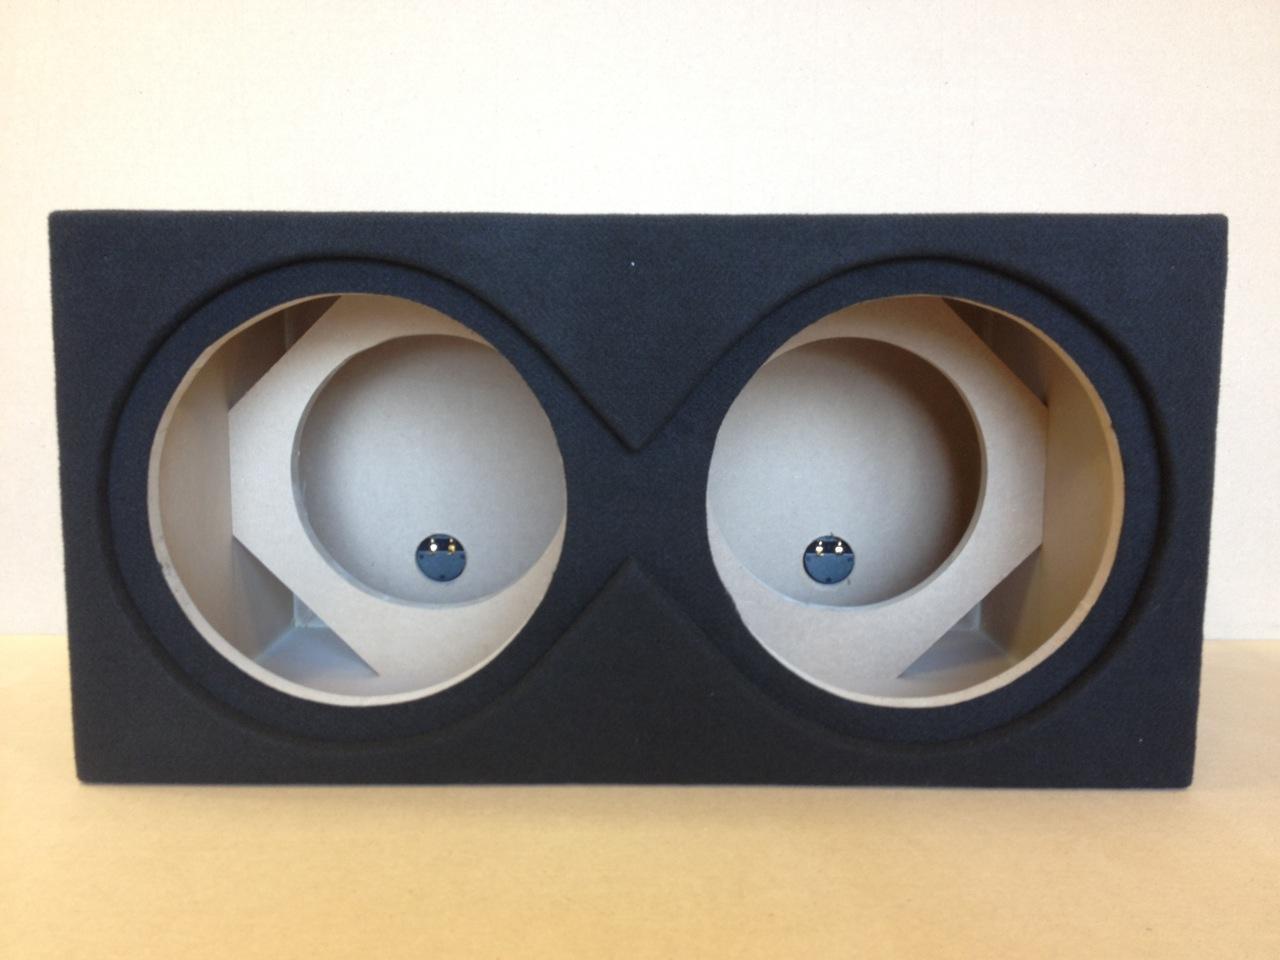 "Sealed Subwoofer Enclosure for 2 12"" JL Audio 12w7 Subs ..."